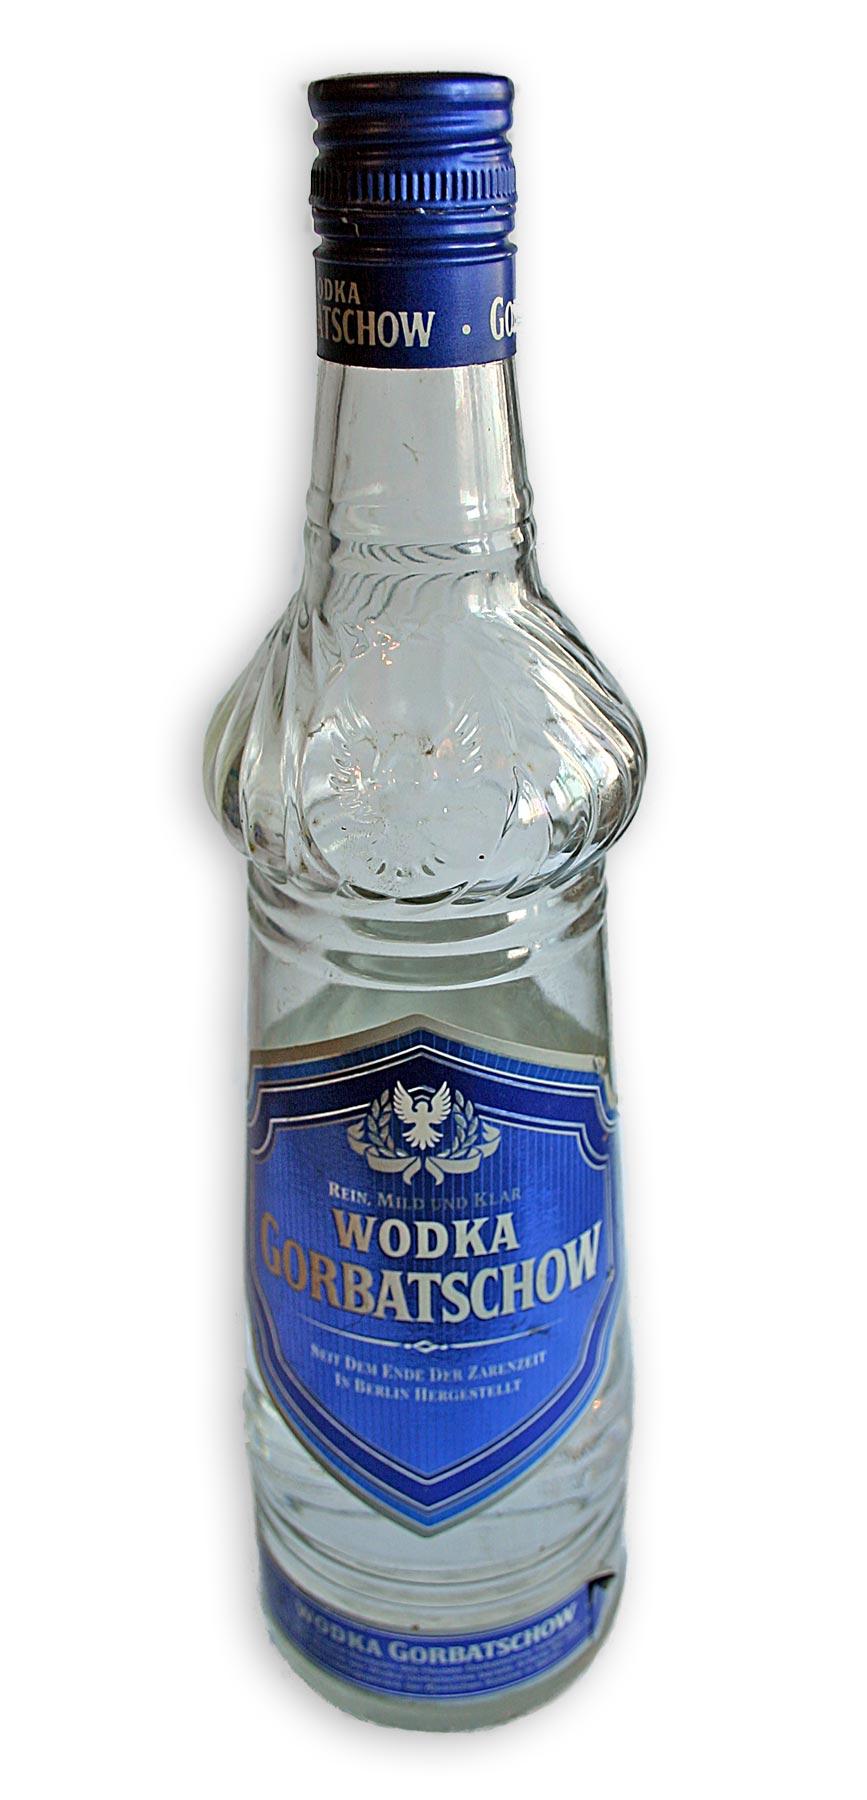 Wodka_gorbatschow.jpg